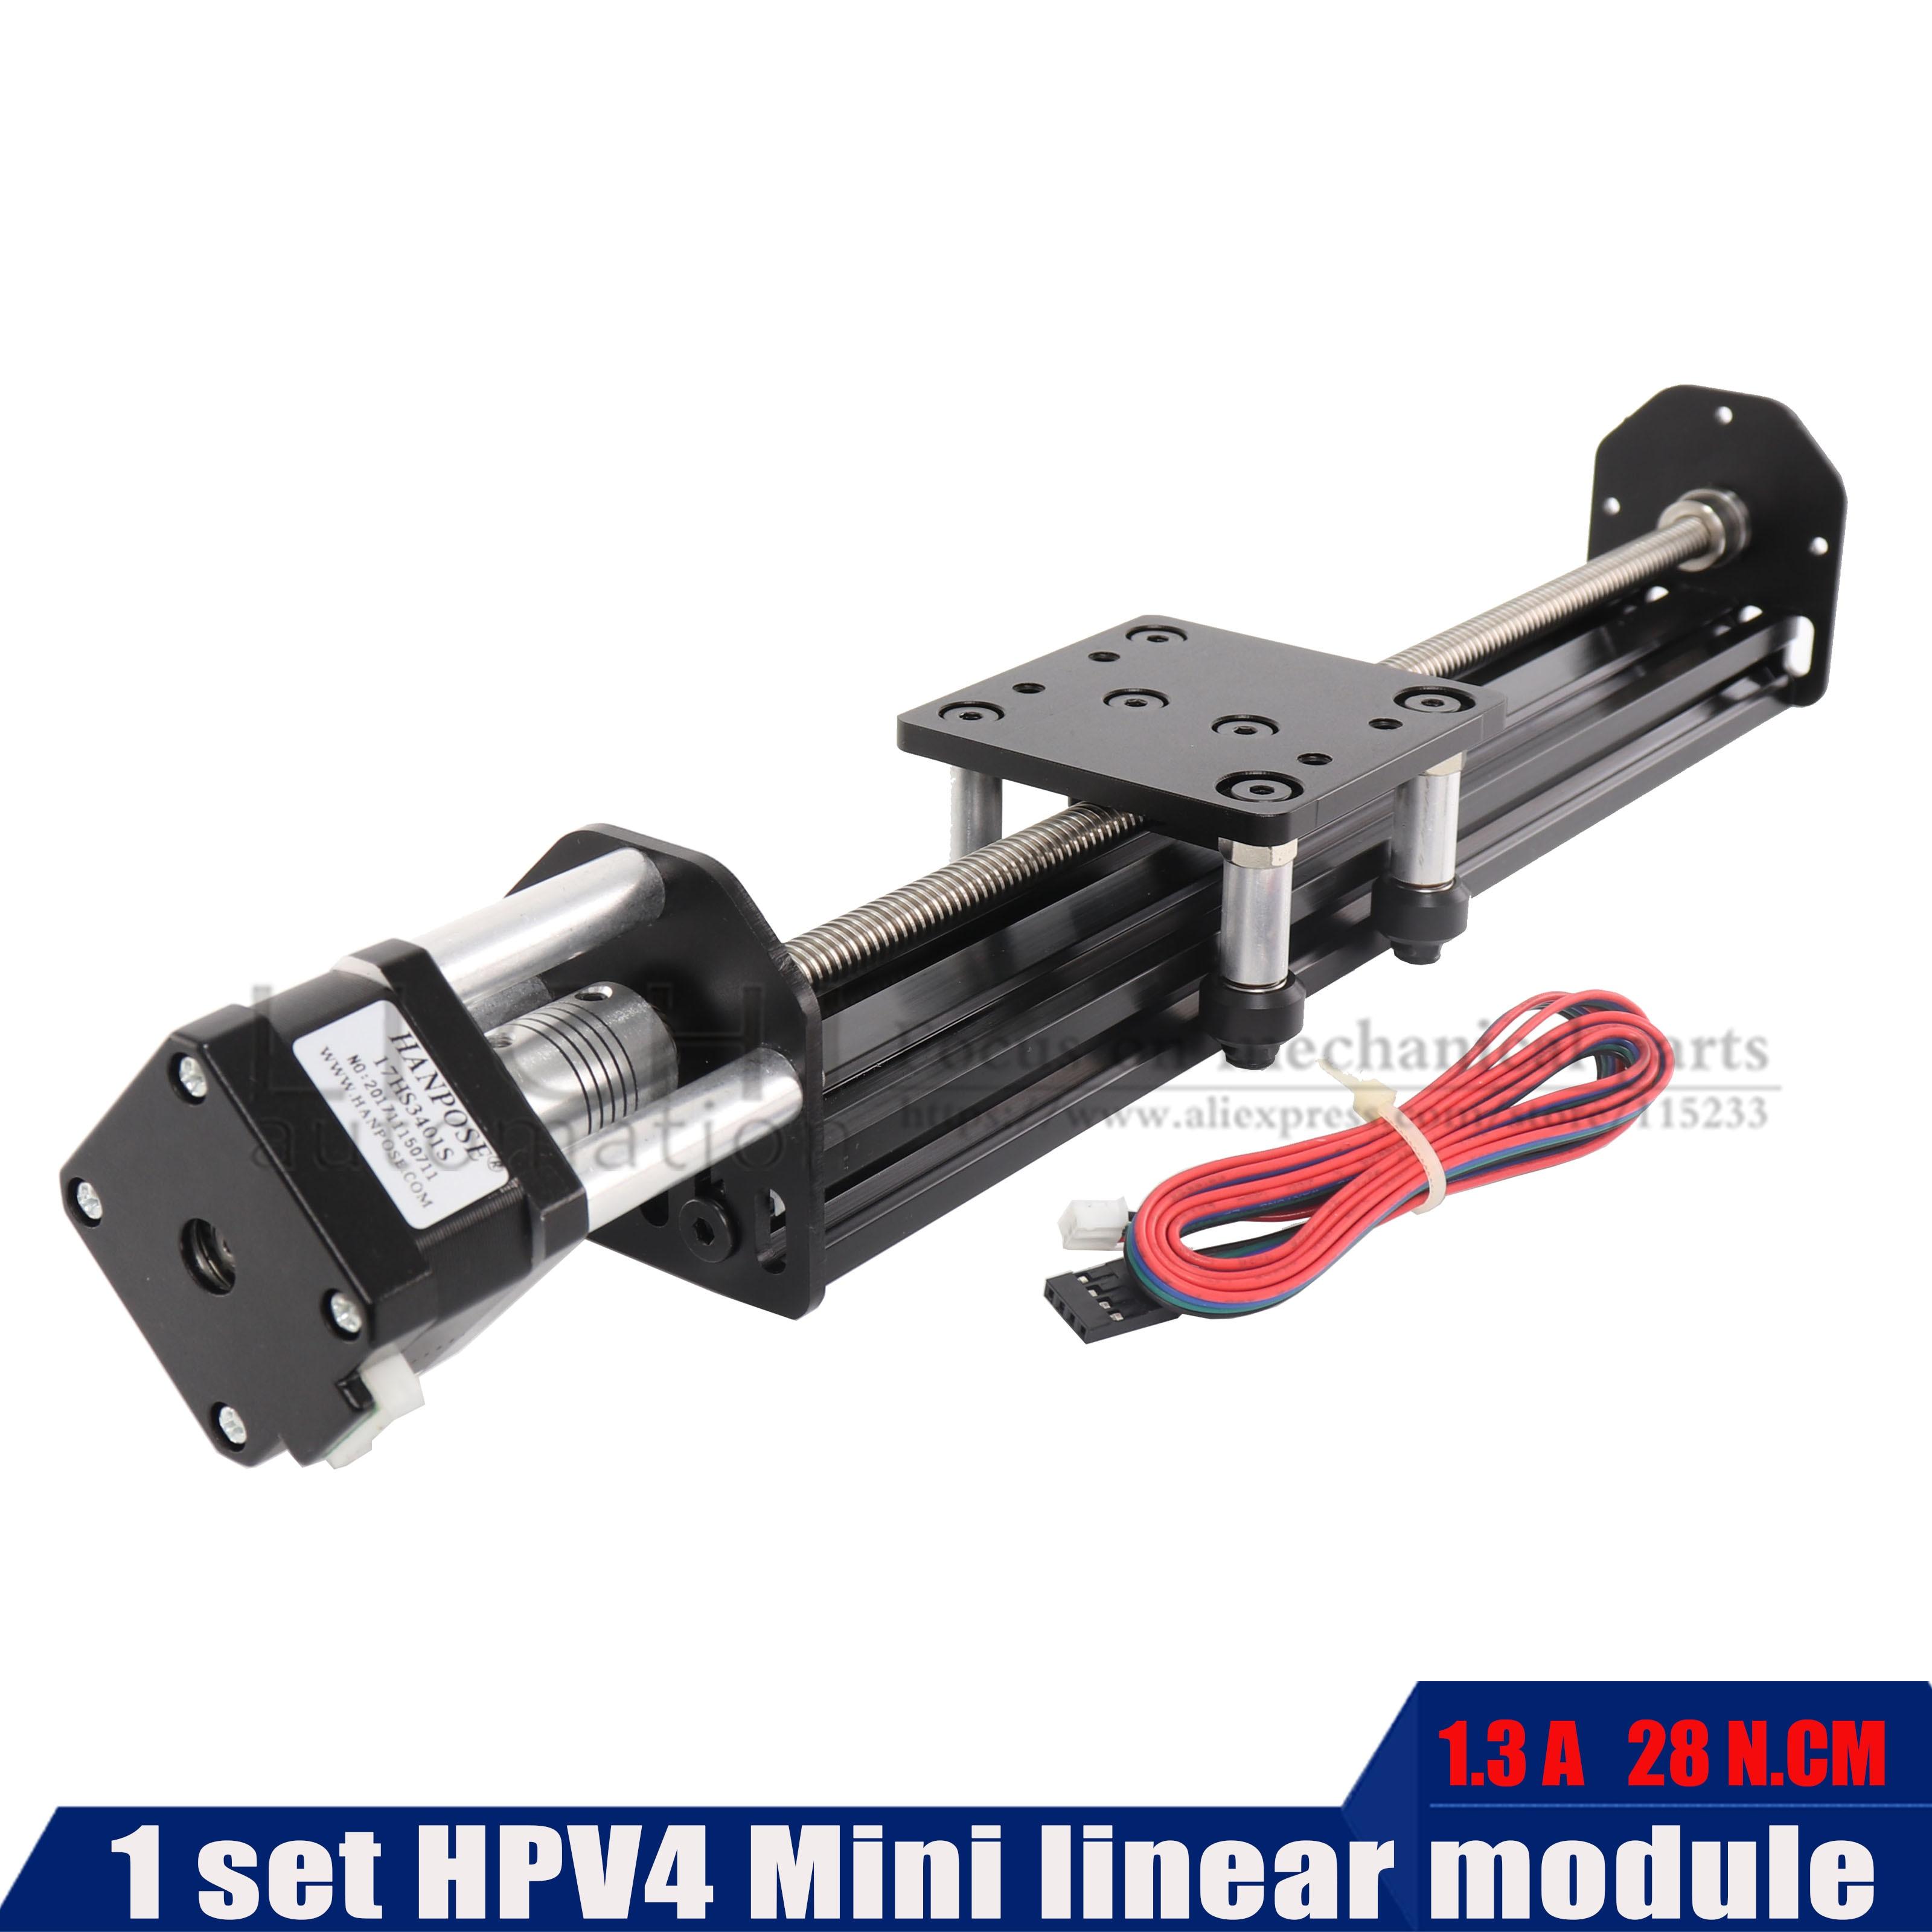 HPV4 NEMA17 stappenmotor 100 200 300 400 V Slot Lineaire model Z as router kit Reprap 3D printer sapre onderdelen-in Lineaire Gidsen van Woninginrichting op Guangzhou  LiChi Electromechanical Automation Co., Ltd.